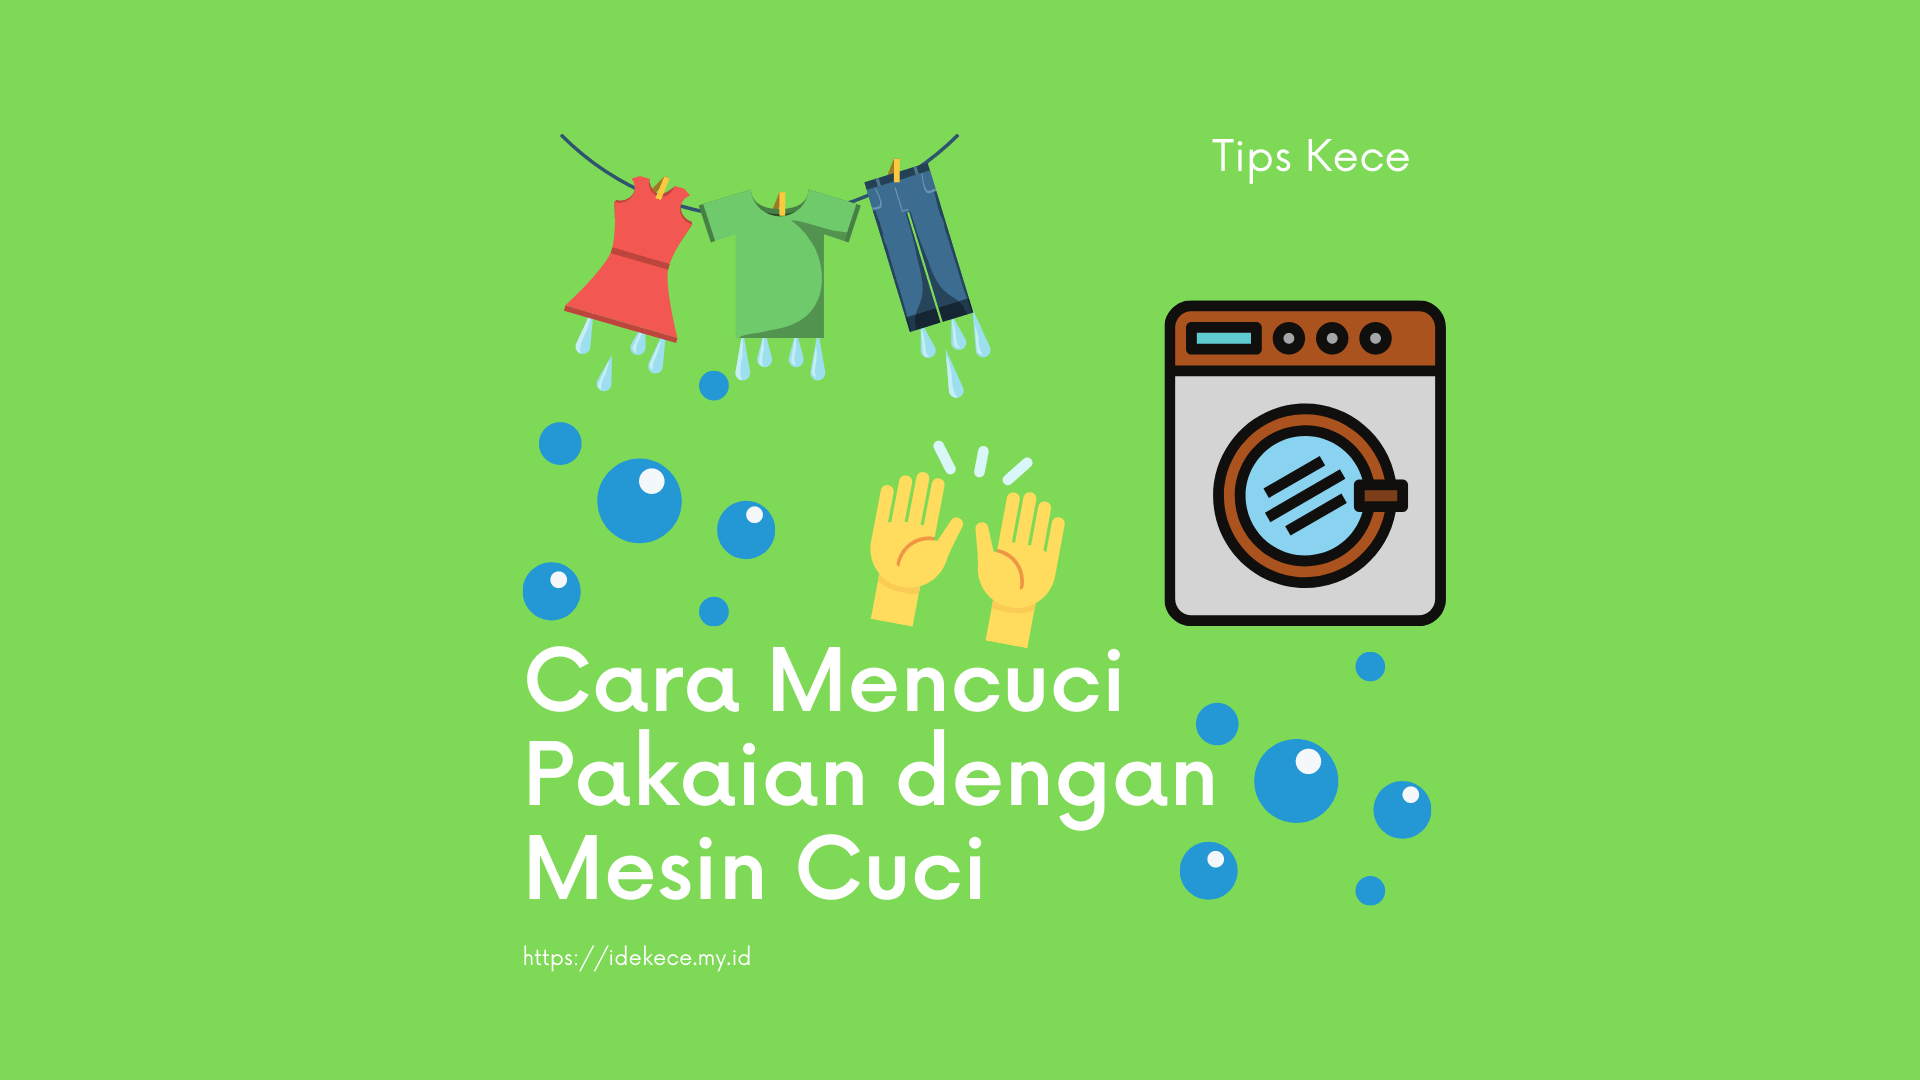 Cara Mencuci Pakaian dengan Mesin Cuci